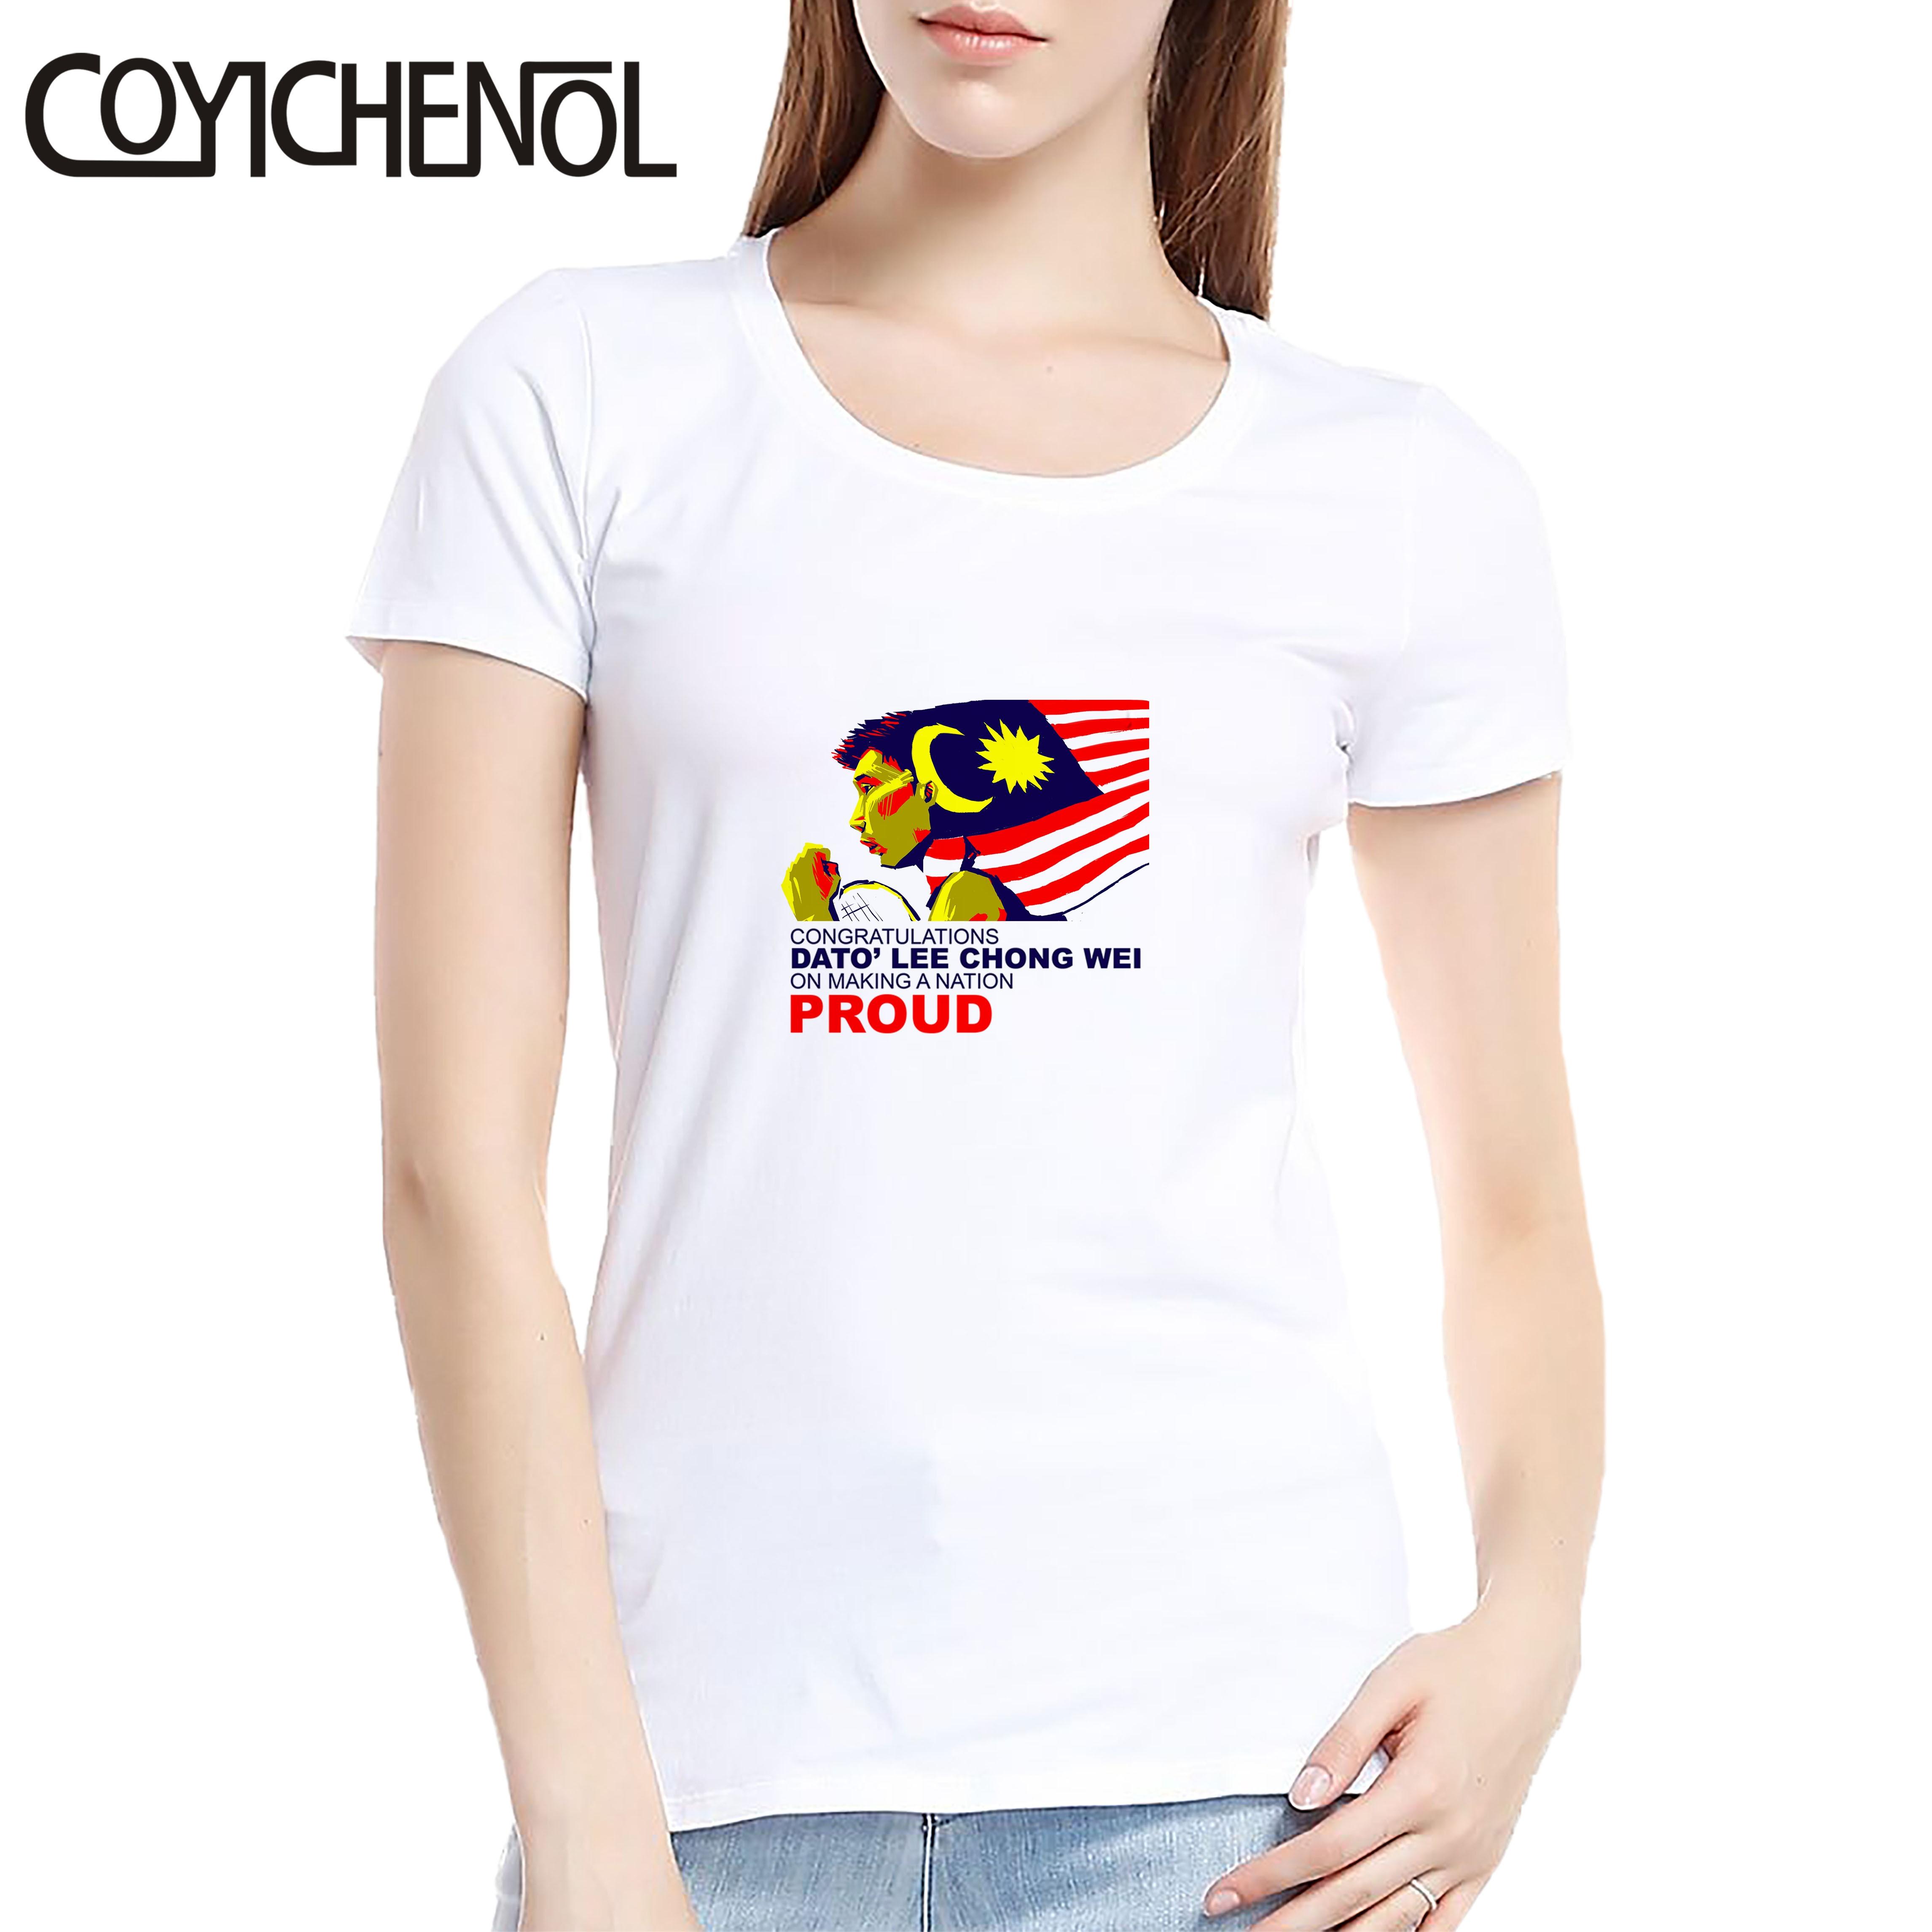 Camiseta de mujer lee chong Wei, camiseta de mujer, 6XL, diseño de color sólido, top modal, camiseta de verano de manga corta, COYICHENOL